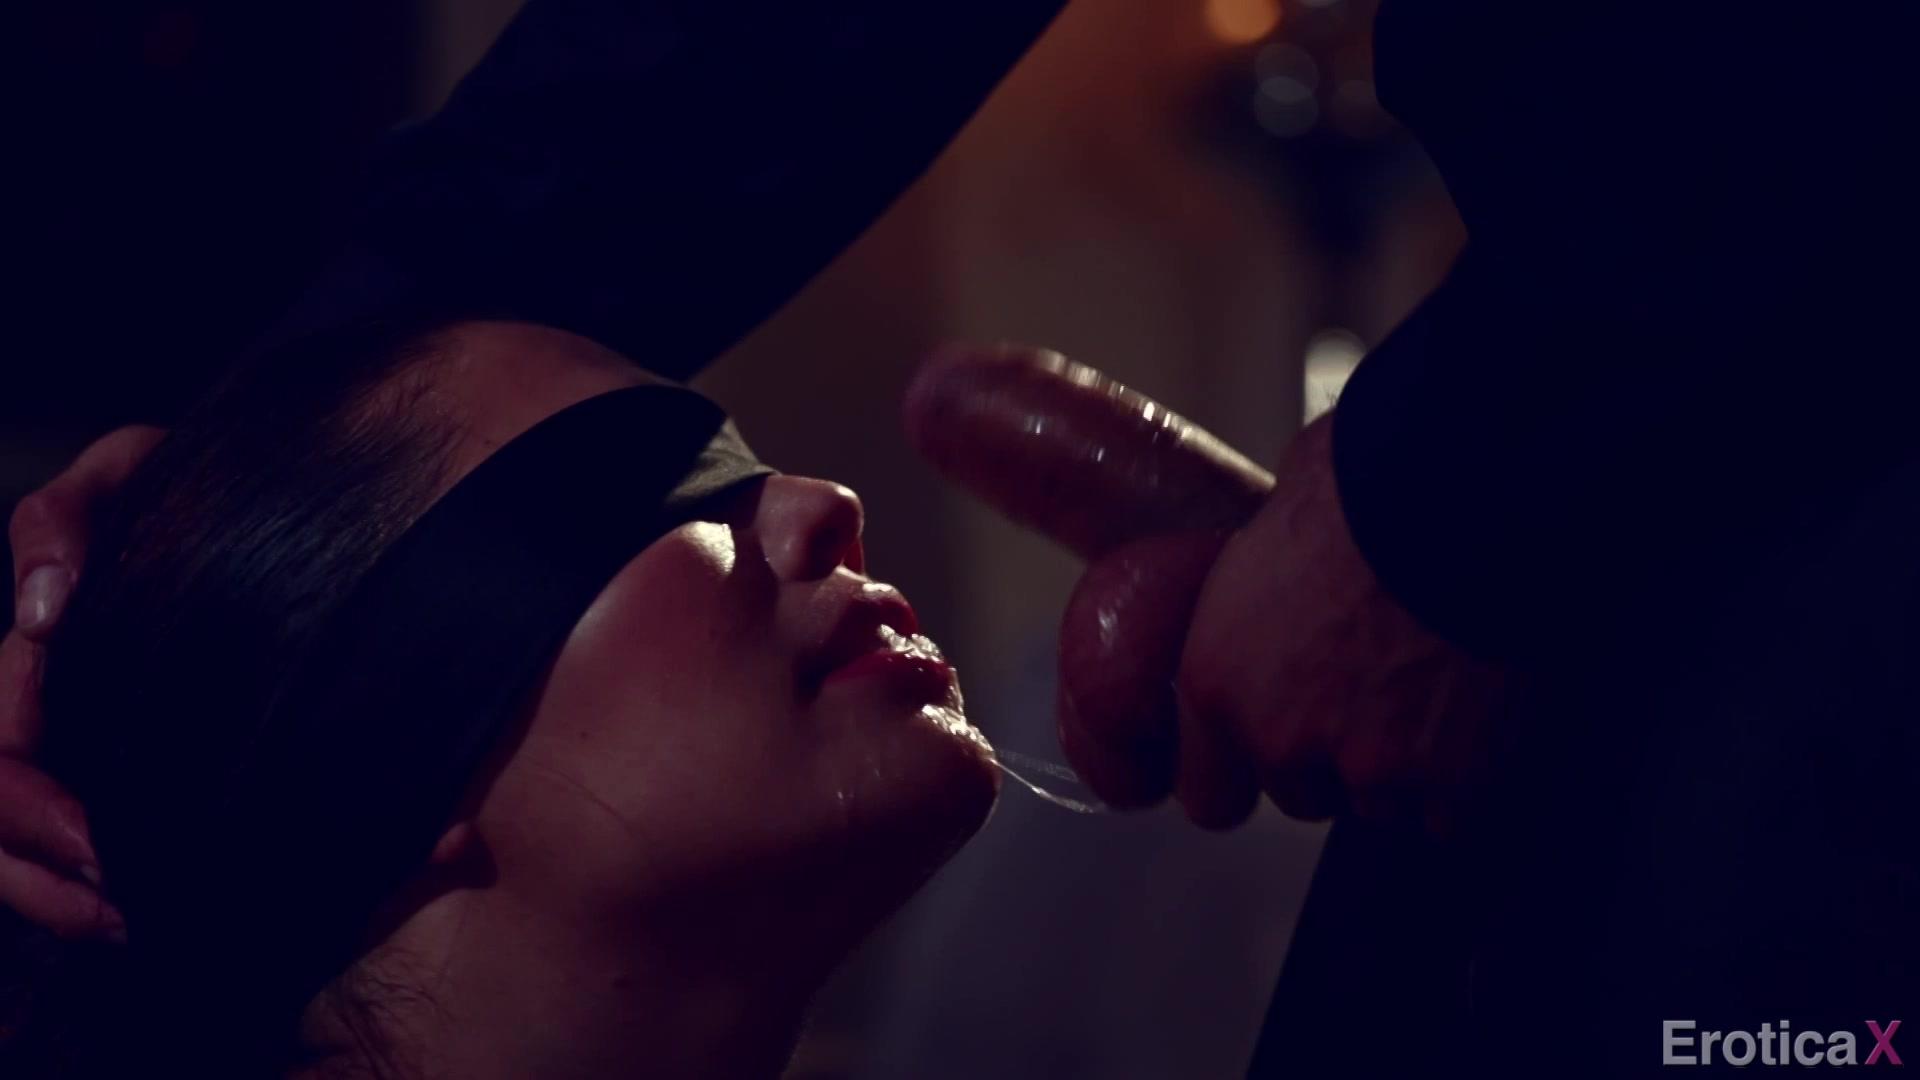 romanticheskiy-uzhin-seks